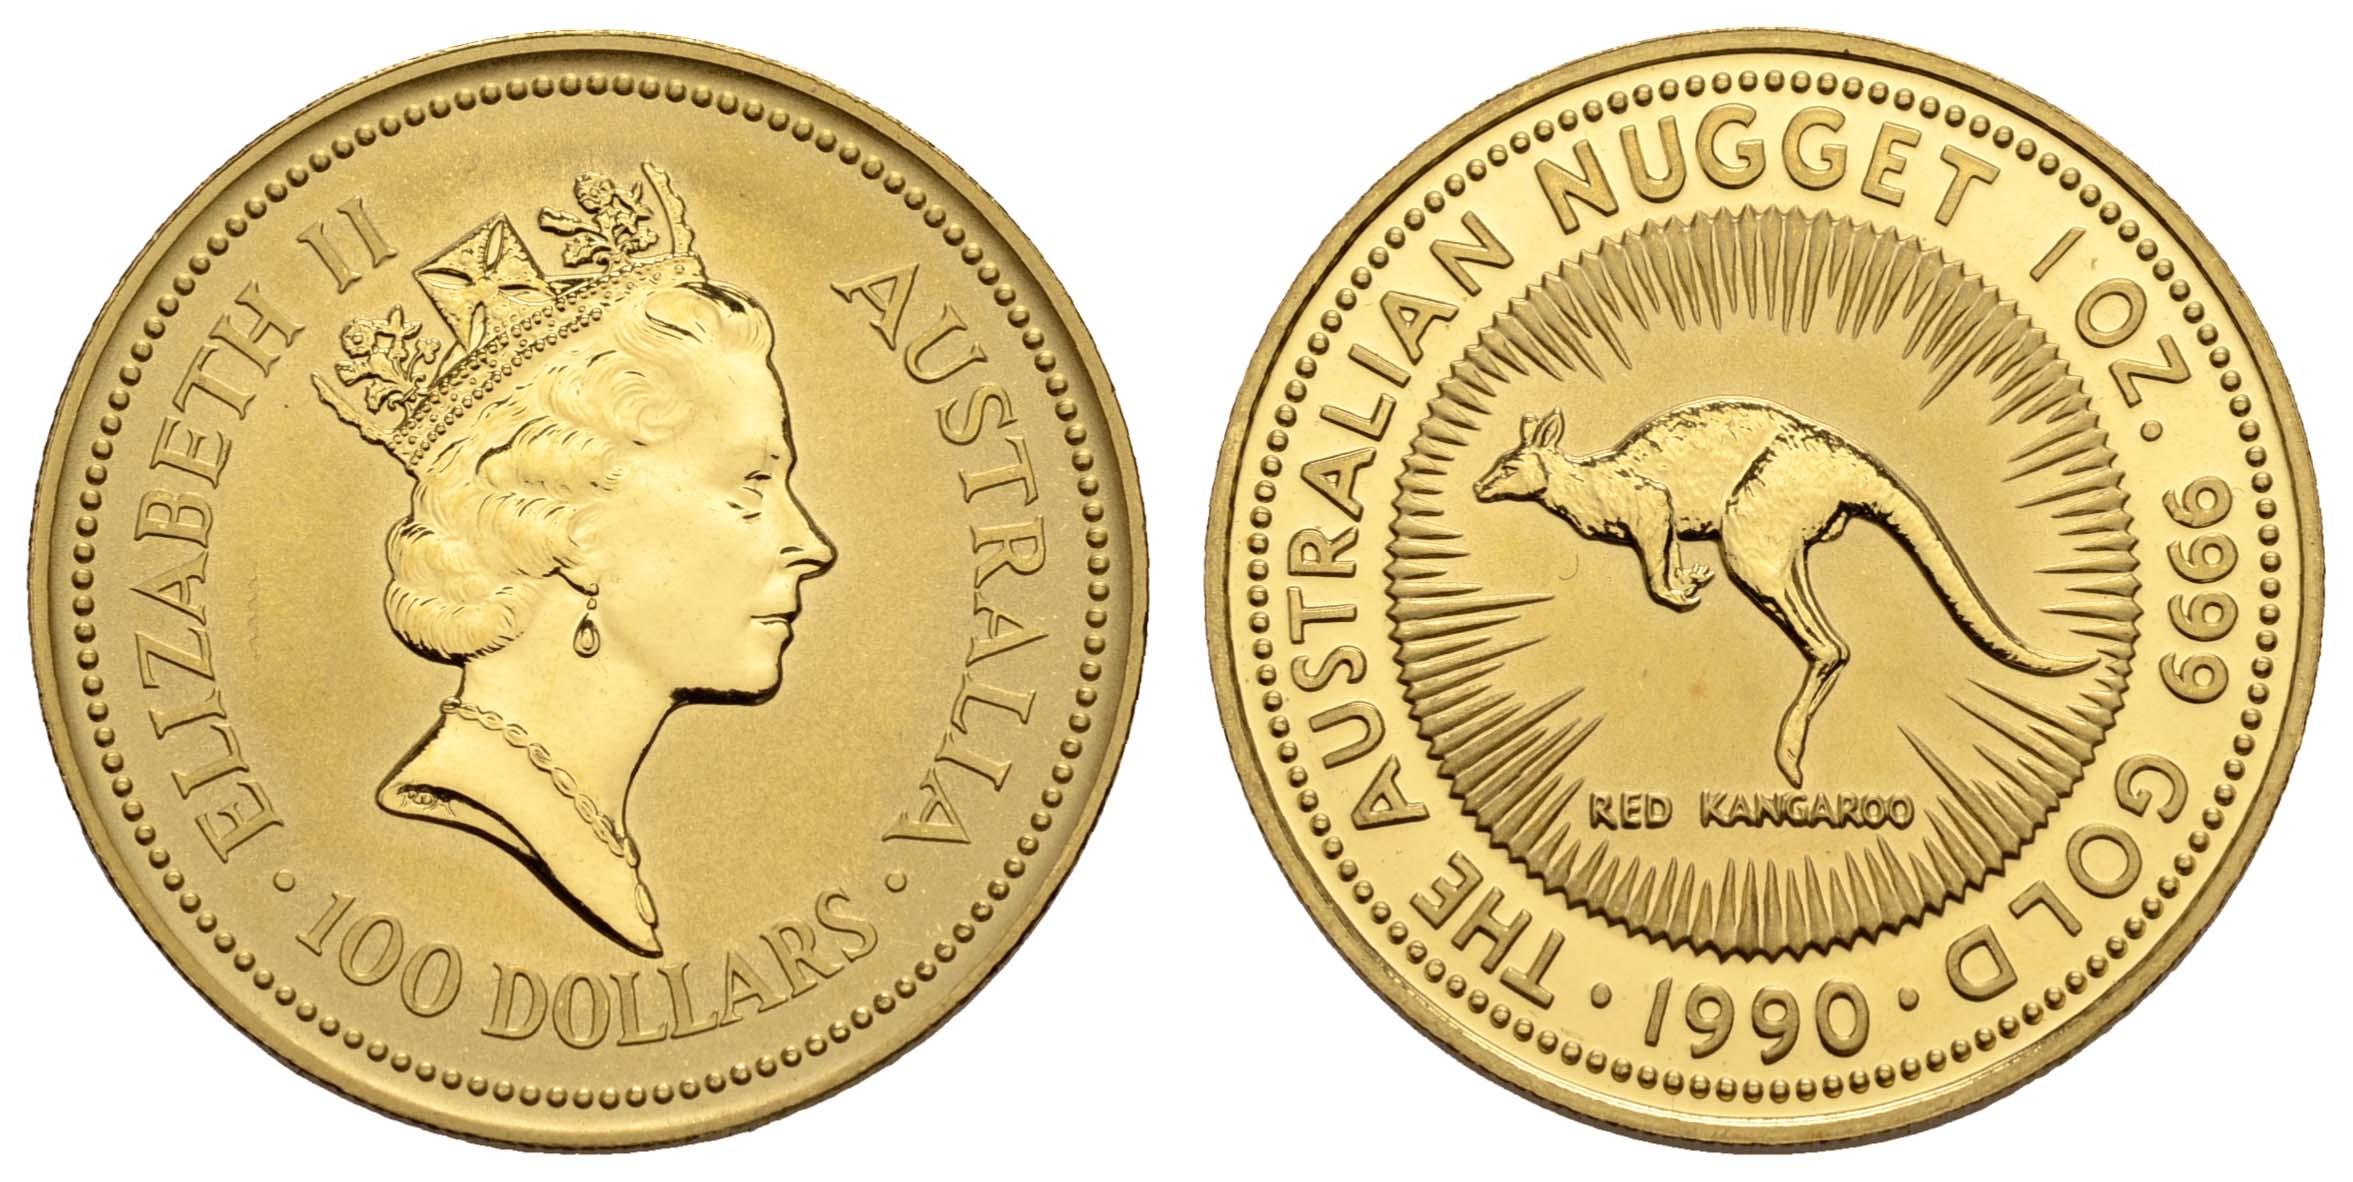 Lot 1866 - übersee australien -  Auktionshaus Ulrich Felzmann GmbH & Co. KG Coins single lots